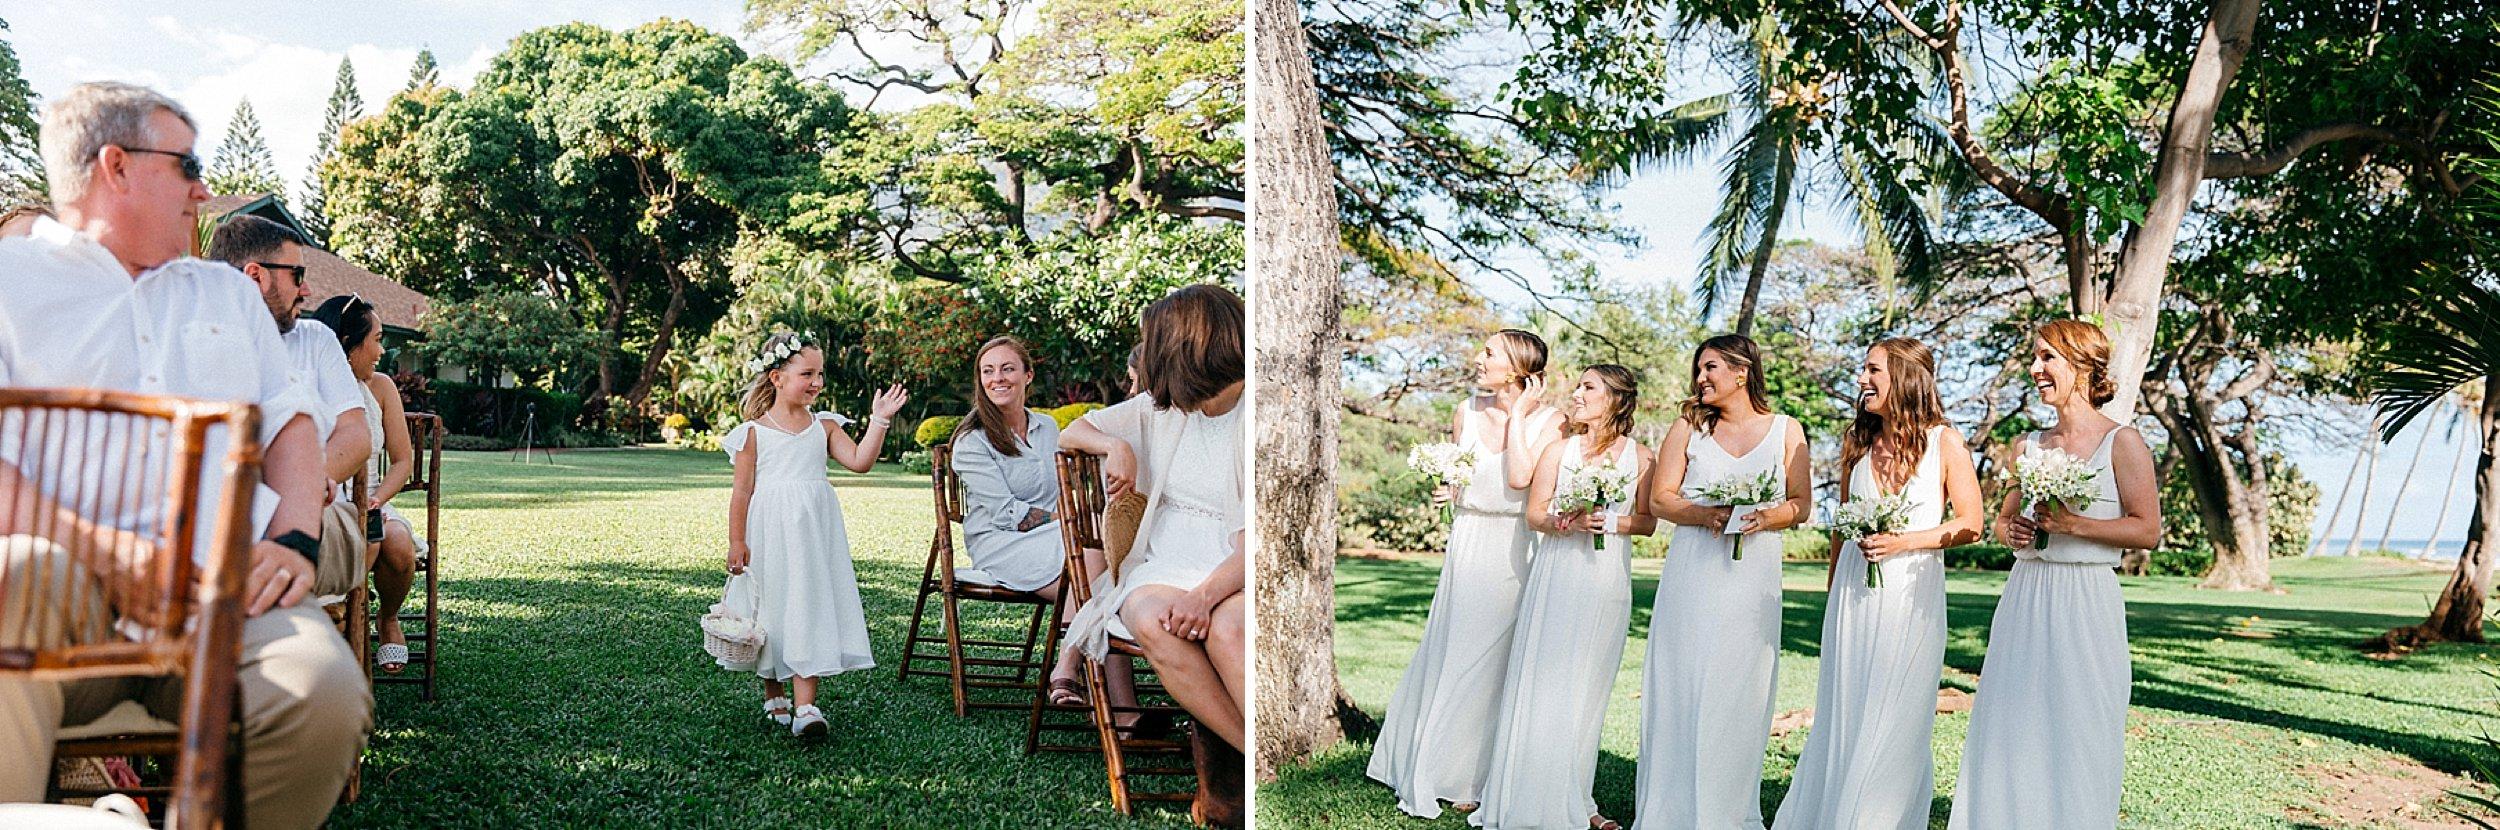 maui-wedding-at-olowalu-plantation-house_0042.jpg